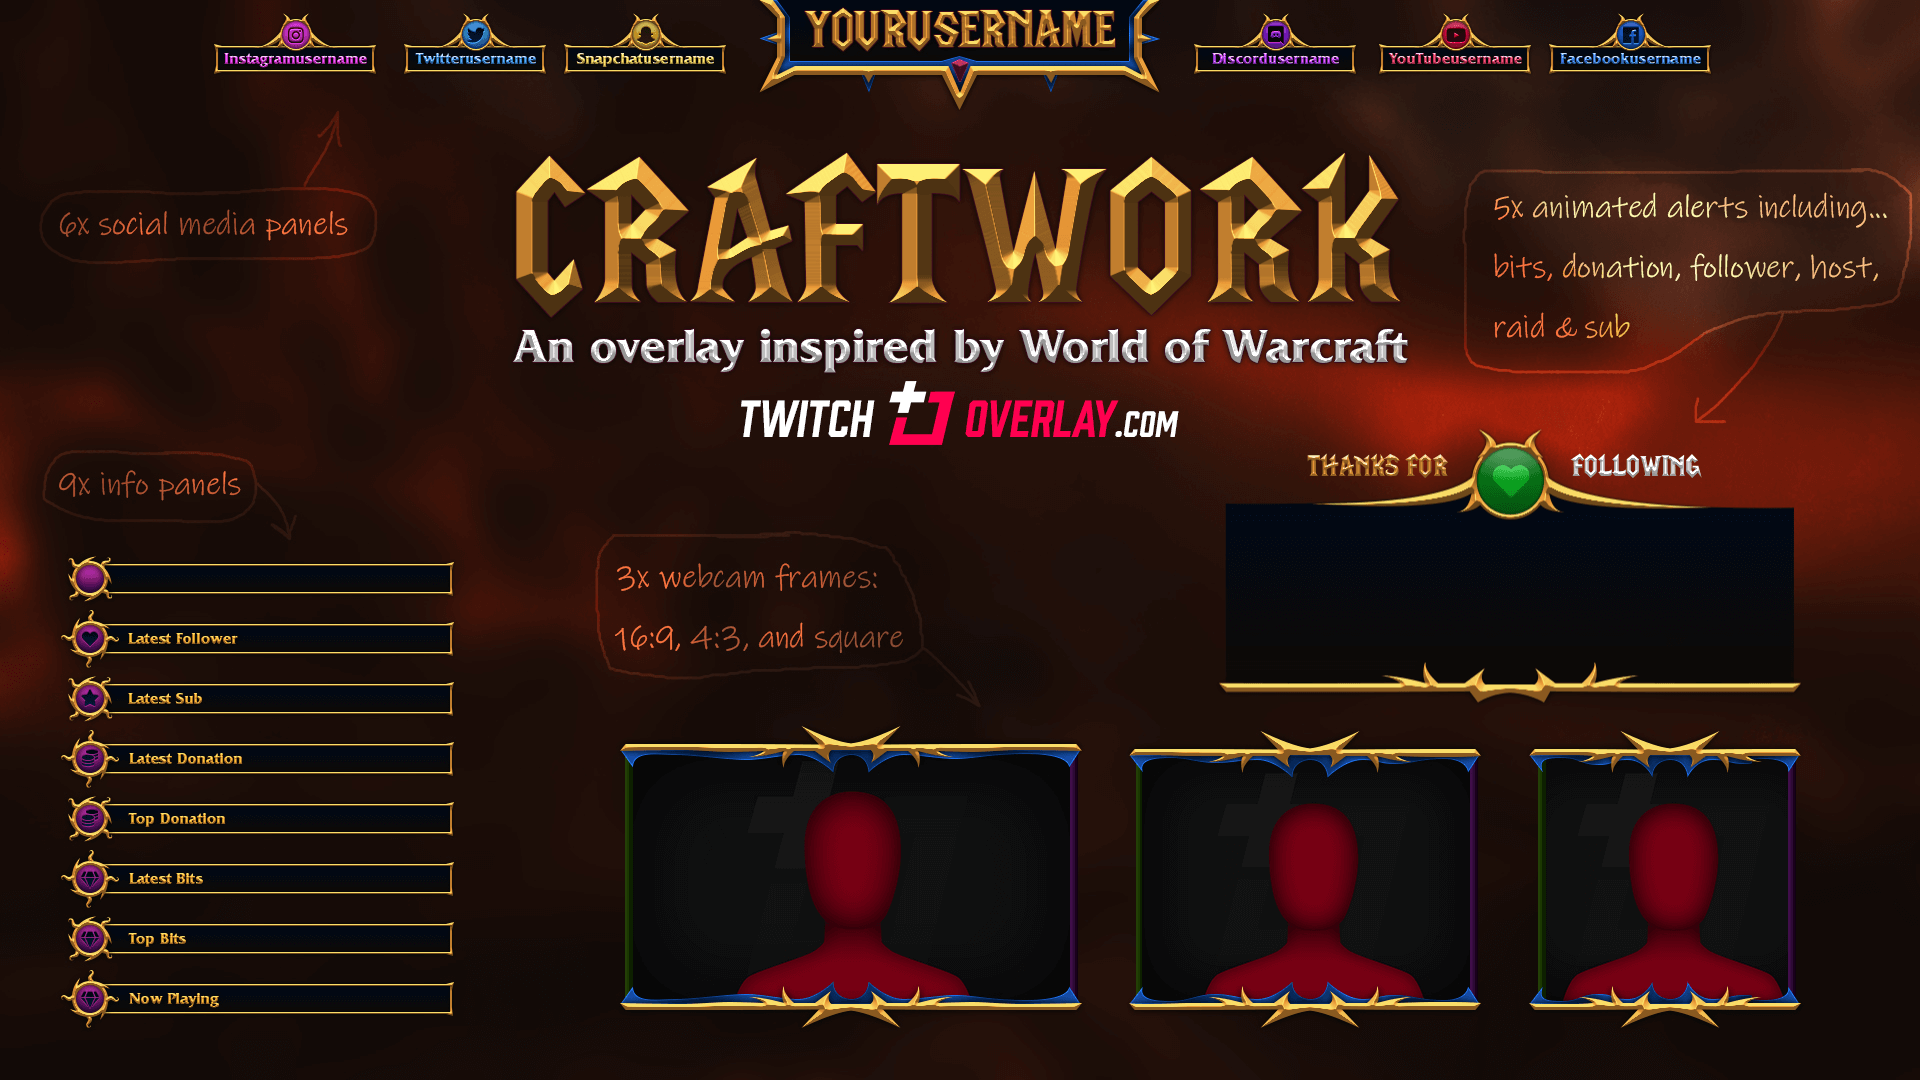 World of Warcraft Stream Overlay - Twitch Overlay